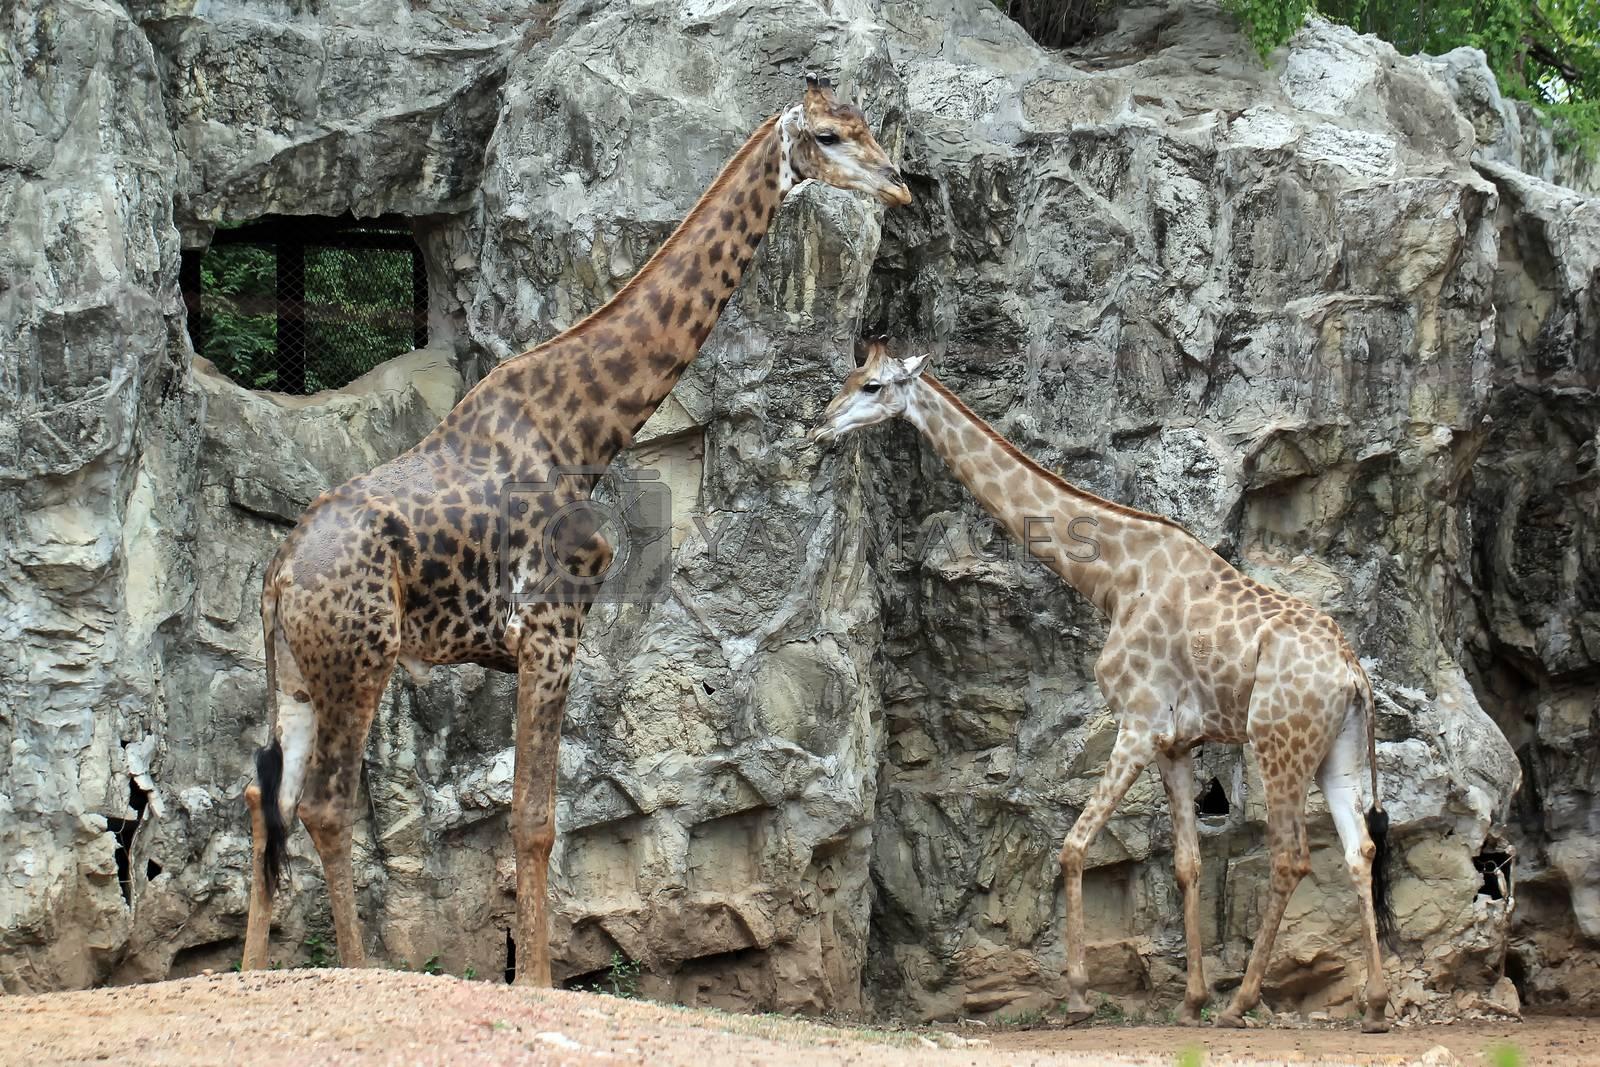 Royalty free image of giraffe by leisuretime70